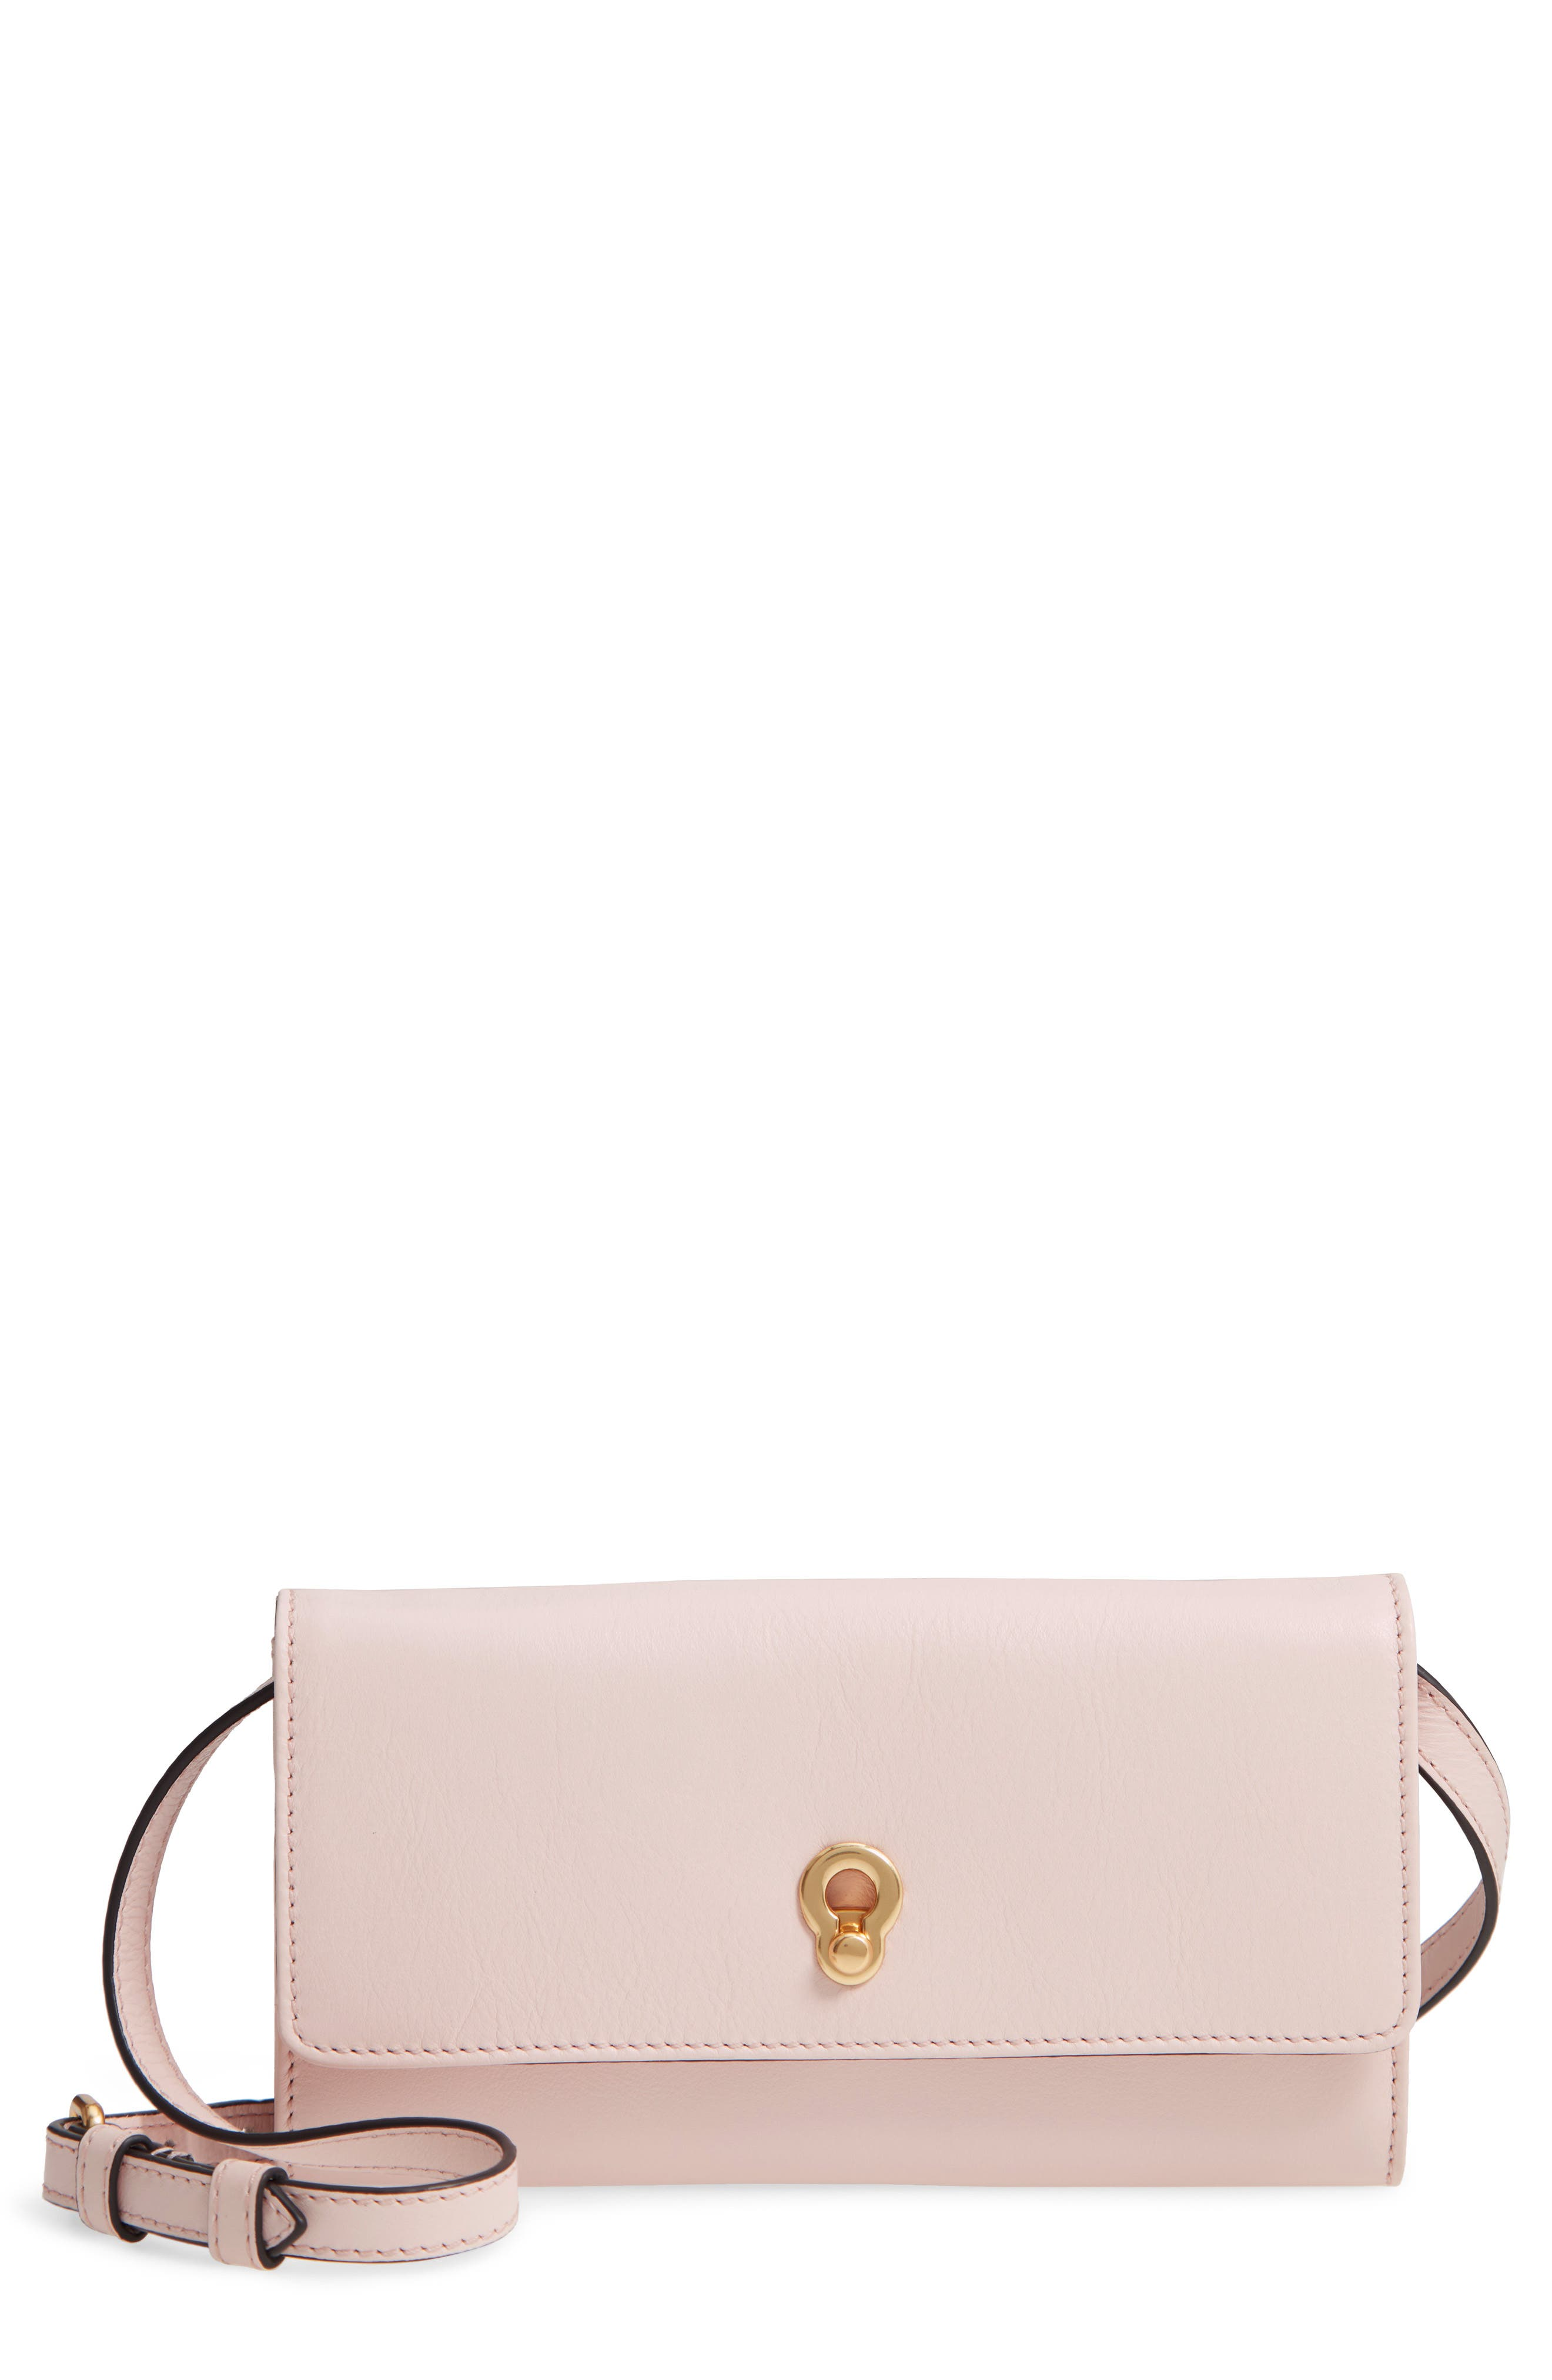 COLE HAAN Zoe Leather Smartphone Crossbody Bag, Main, color, 650